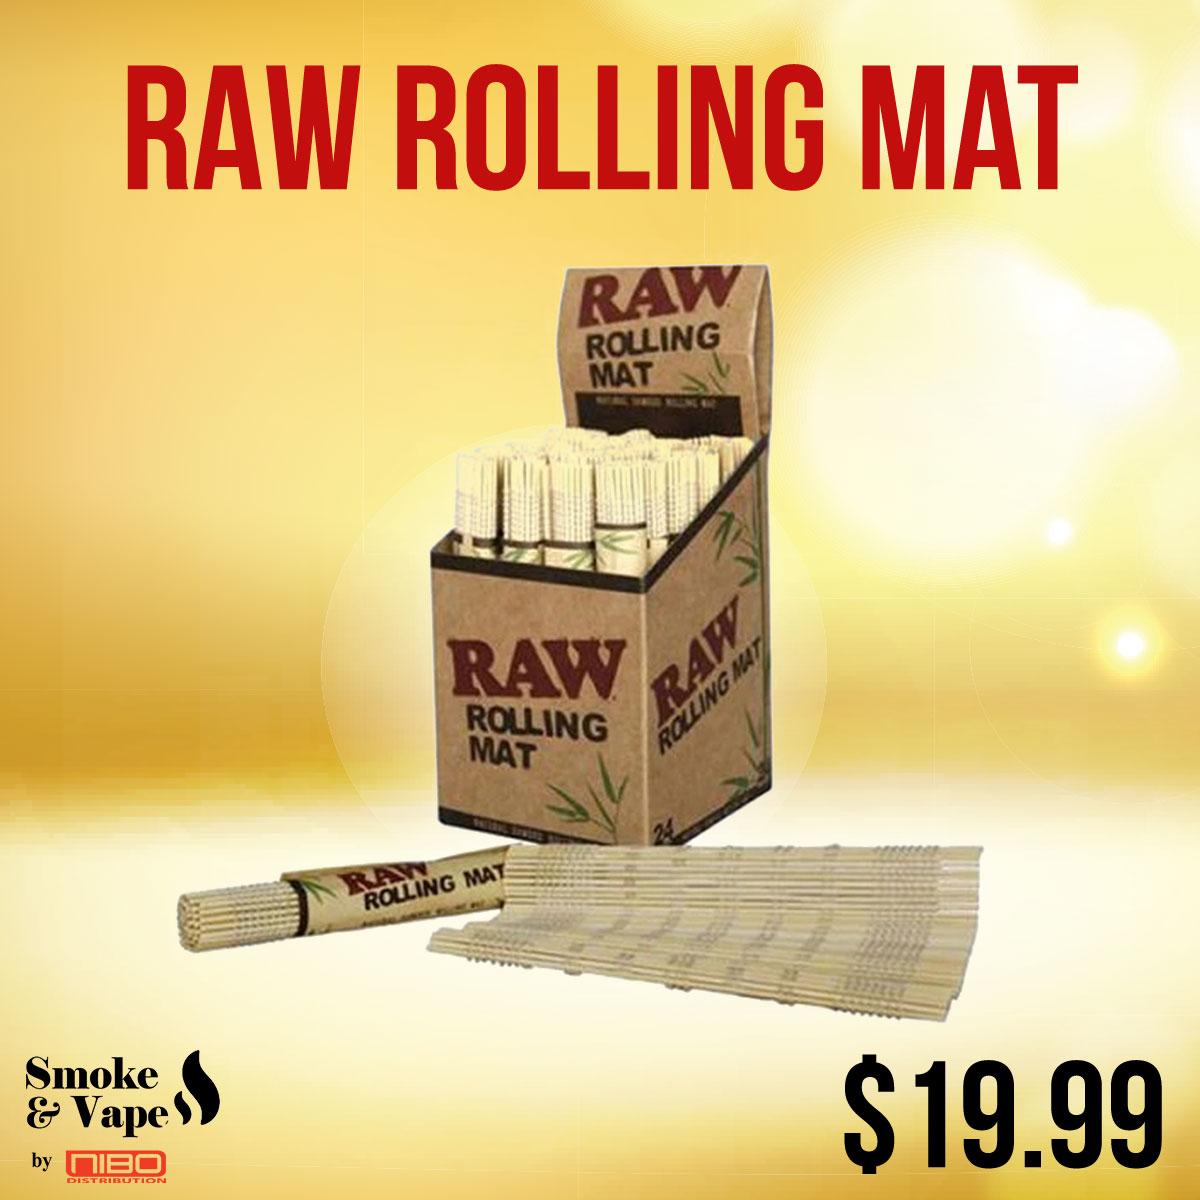 RAW Rolling Mat  https://t.co/YZD0Xrjr8p  #RawTubes #raw_rolling #tray #rawtray #smokeVape #smoking_accessory #rawtraymini #mini #mini_tray #canada #smoking #vaping #smokefans #vape #toronto_smoke_accessory https://t.co/yDqMJa3f9a